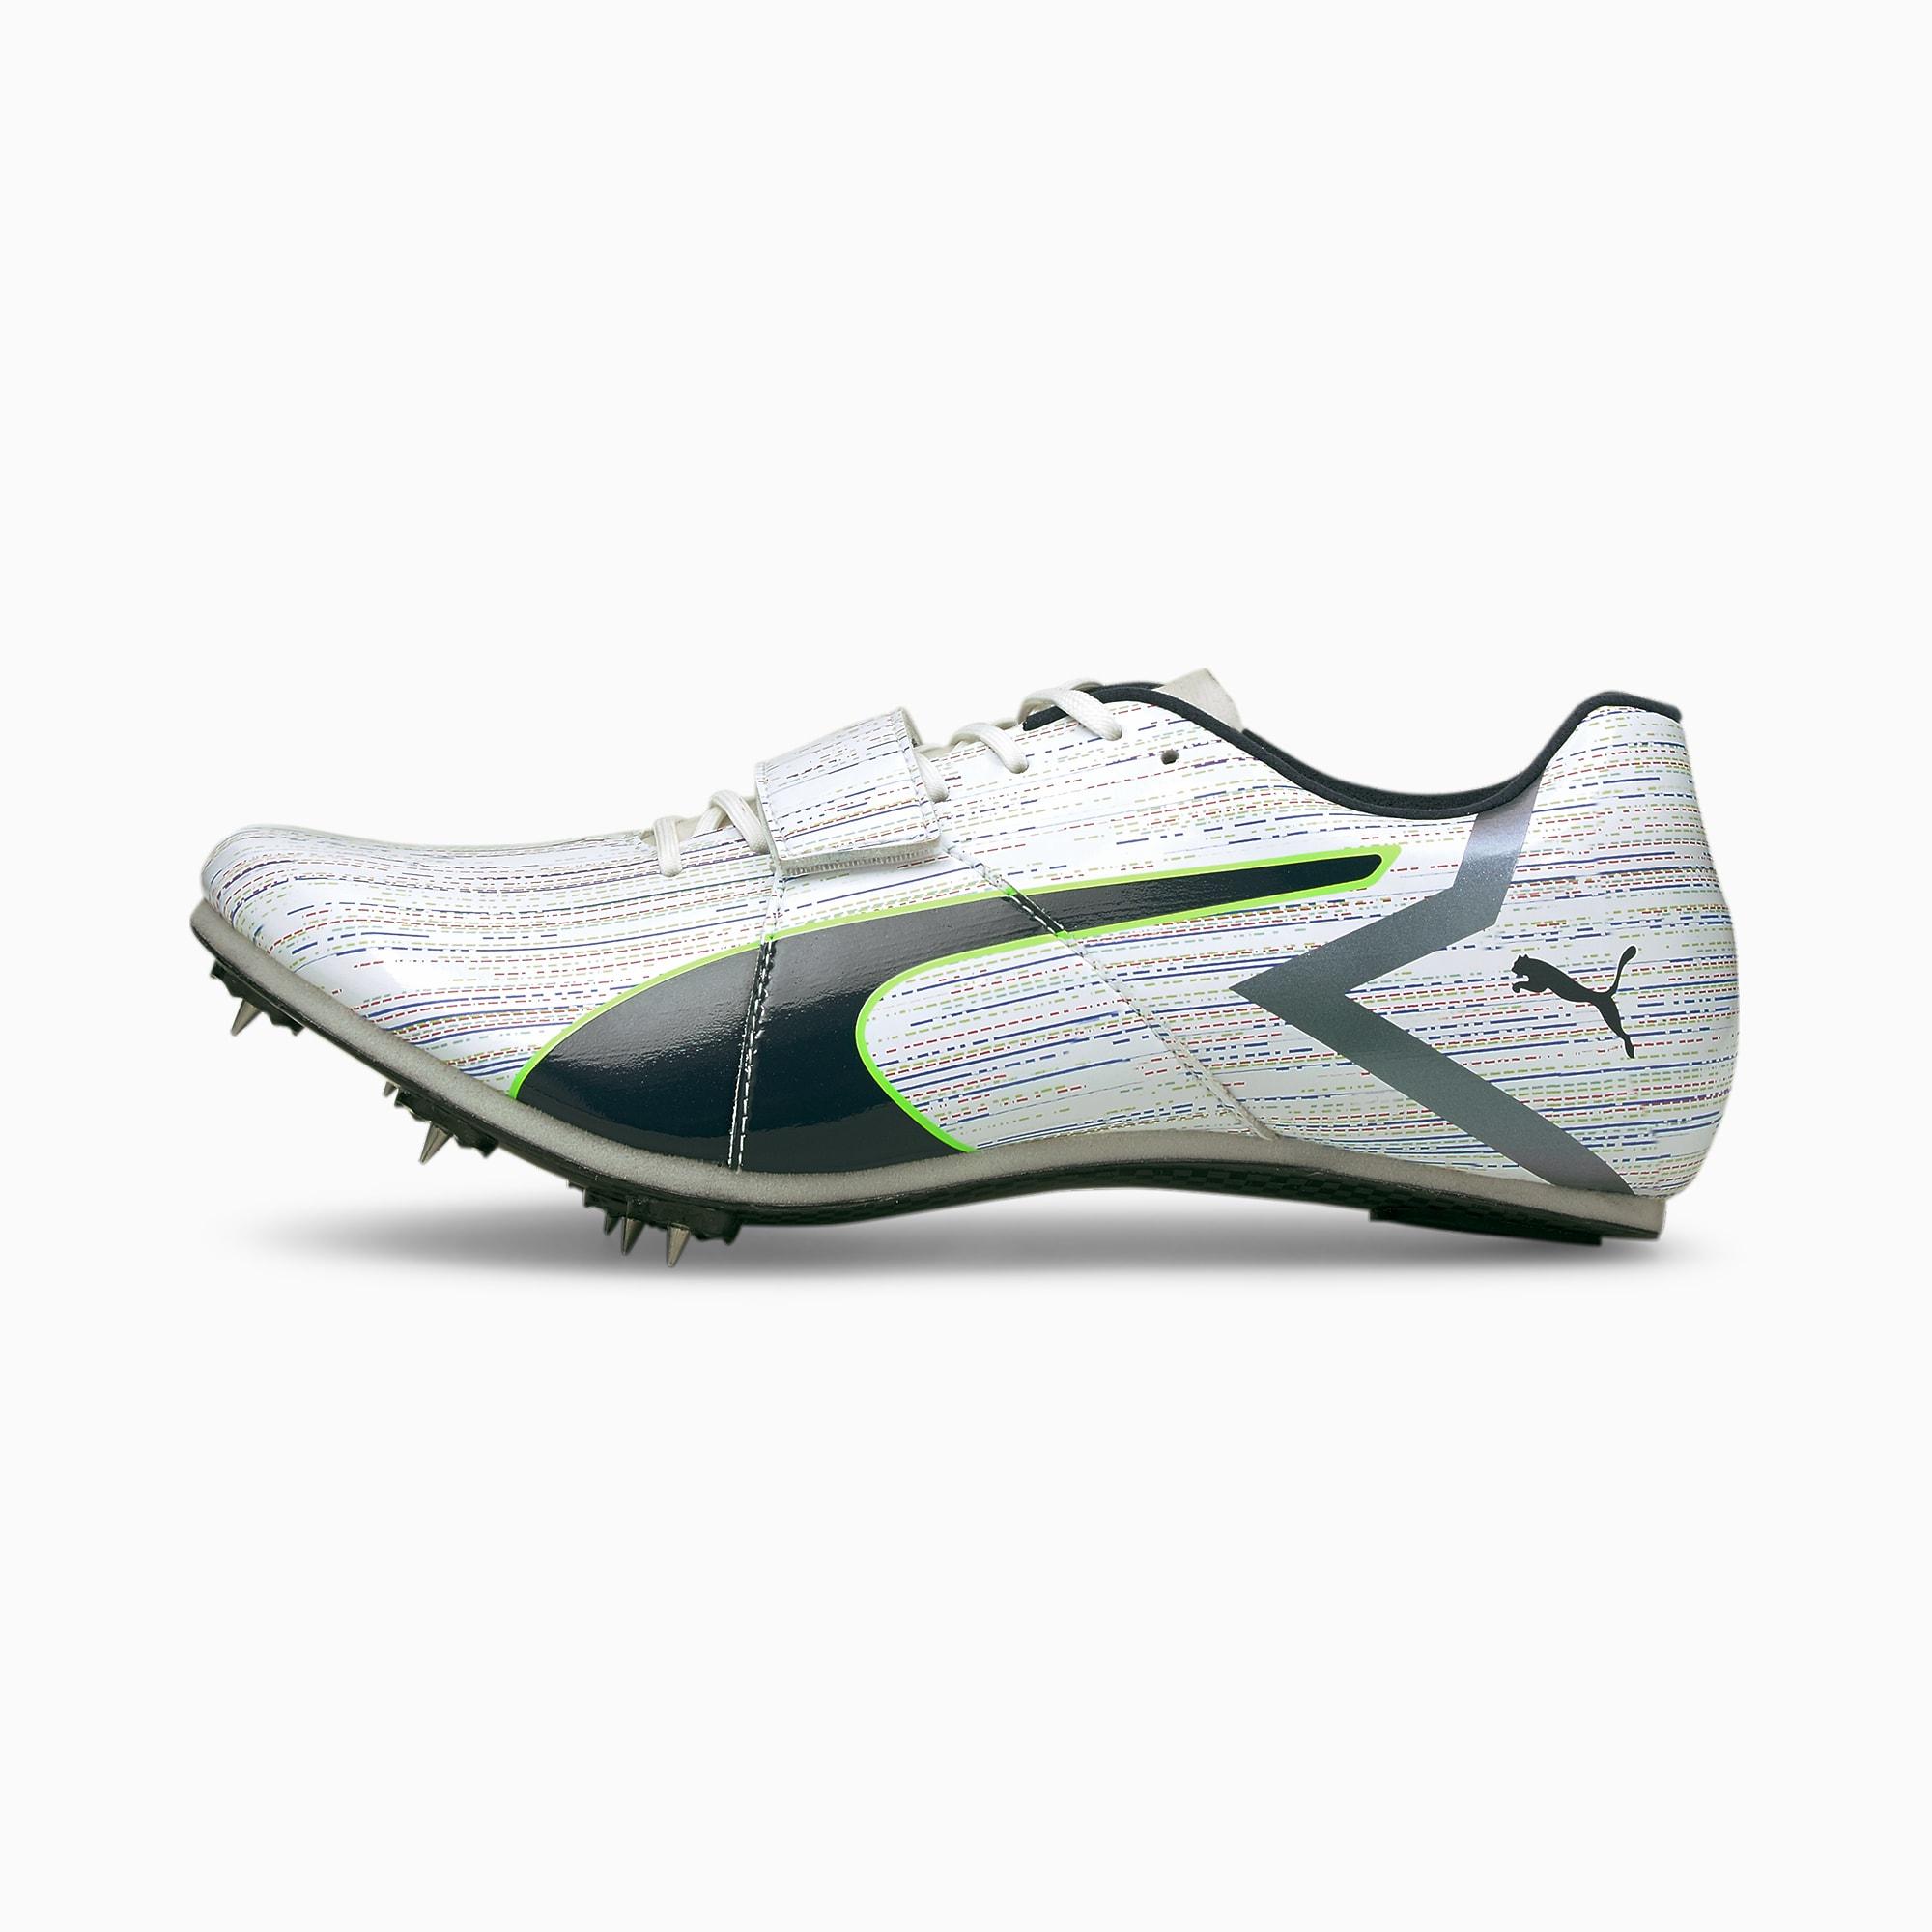 evoSPEED Tokyo Future Nitro Track and Field Shoes